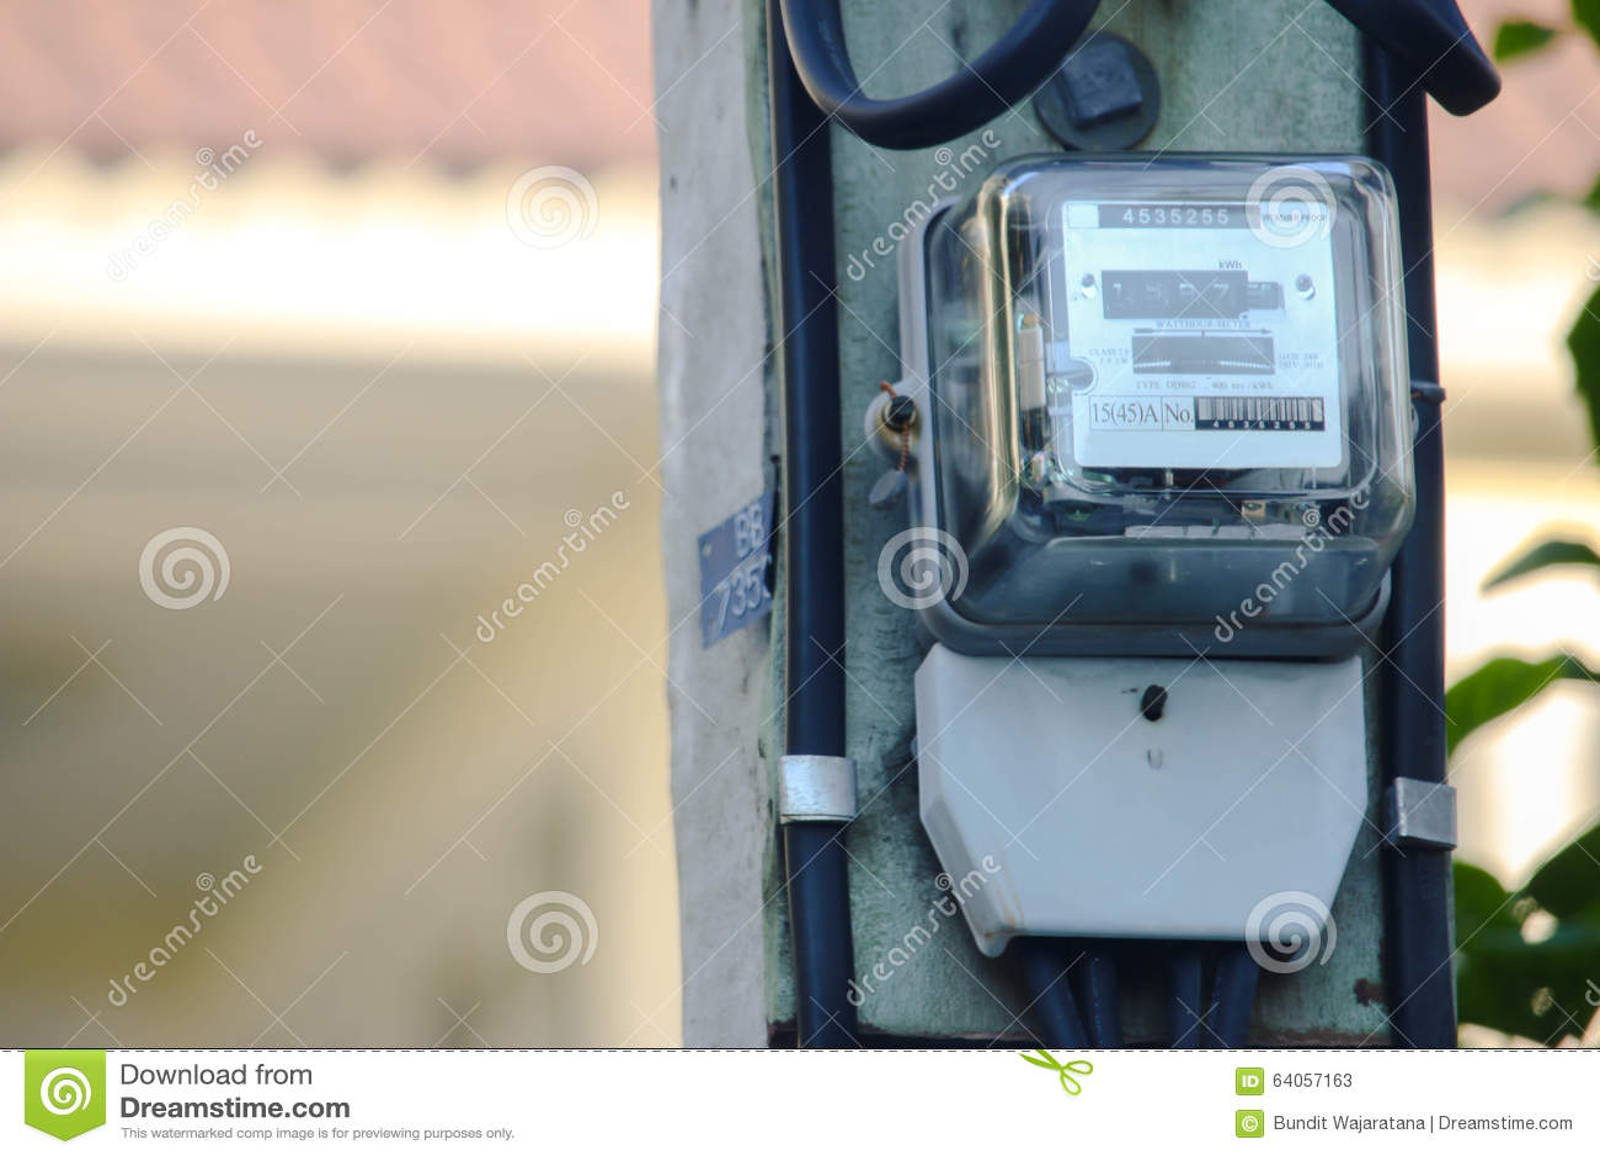 Kilowatt hour meter pole stock image  Image of technology - 64057163